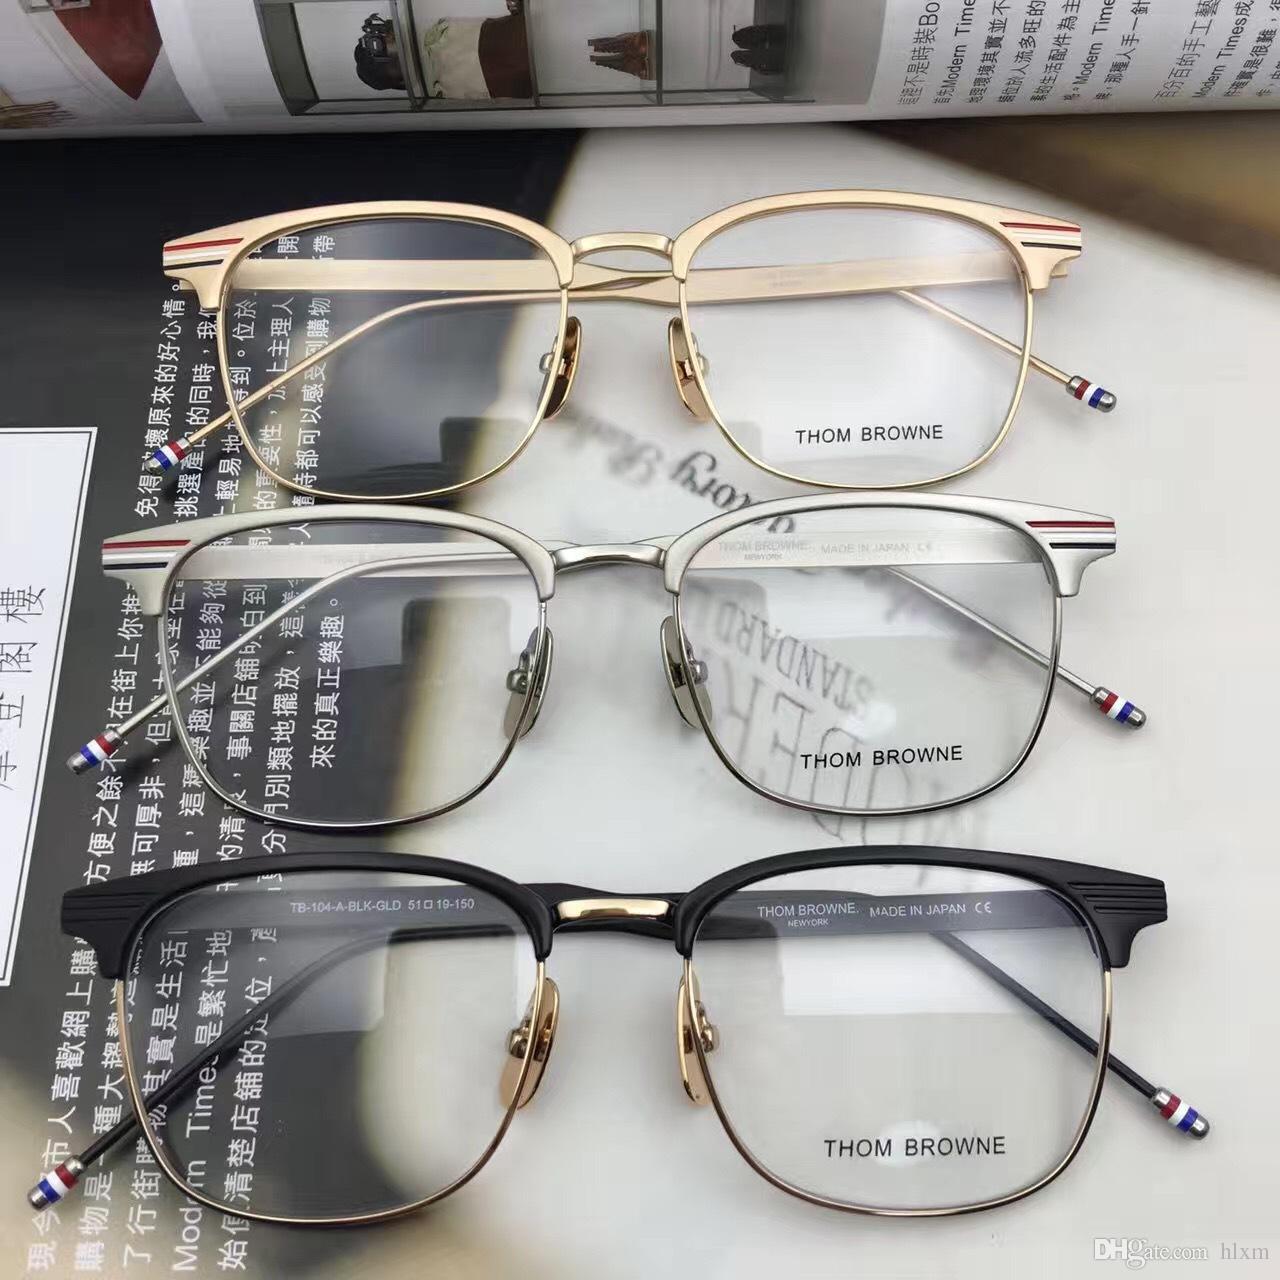 9c01c57228f1 2019 2017 Thom Brand Metal Titanium Eyewear TB104 Eyeglasses Frames Myopia  Reading Optical Frame Speatacle Glasses Frame For Men From Hlxm